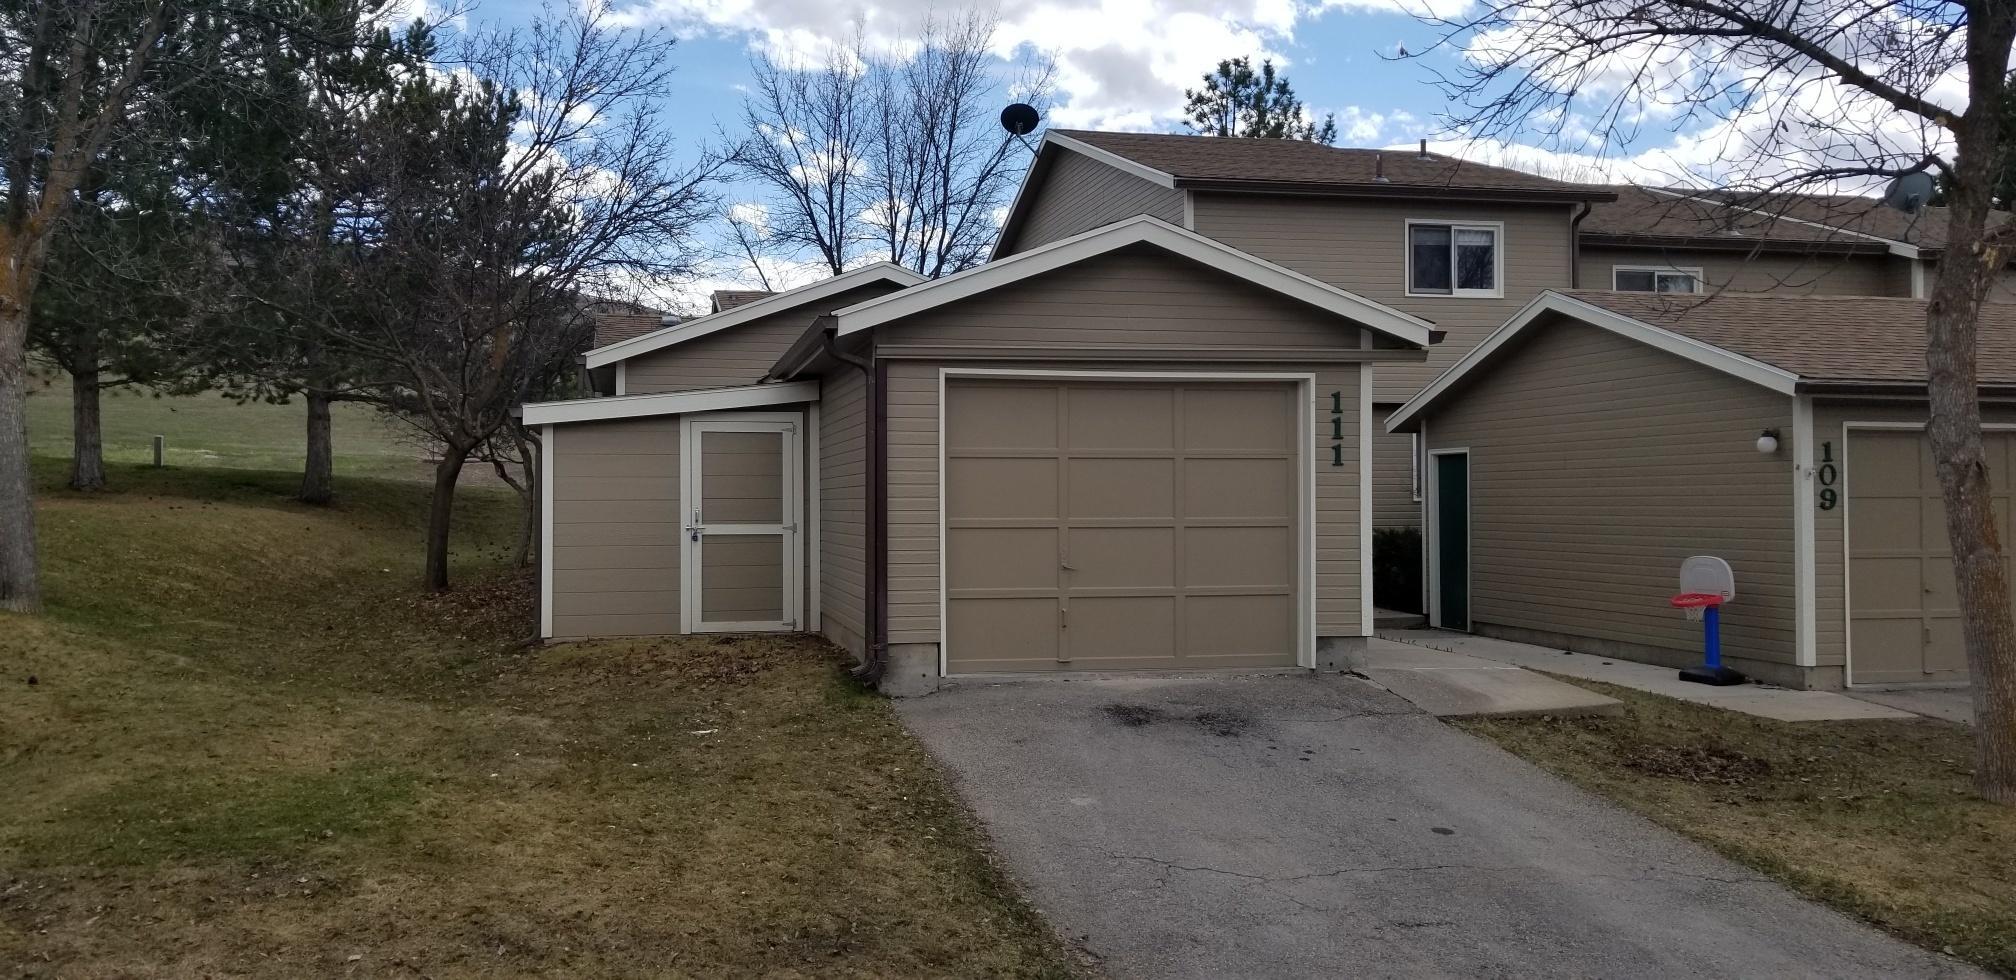 111 Willow Ridge Court, Missoula, MT 59803